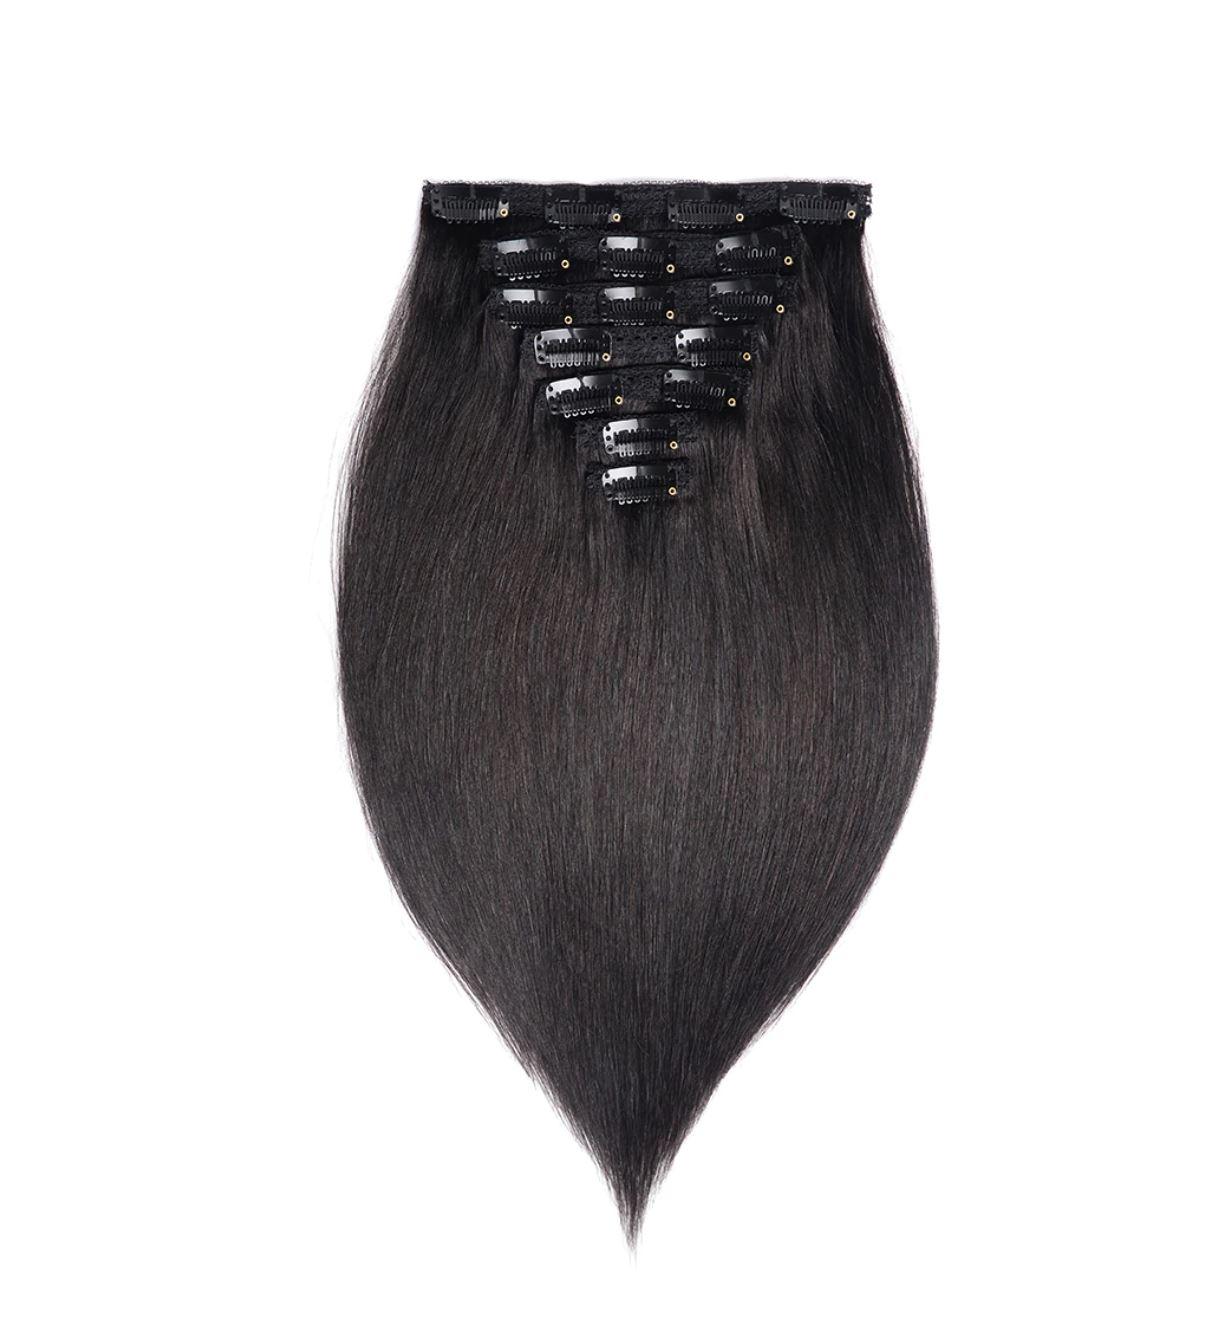 Clip-on Set Hair Extension Method